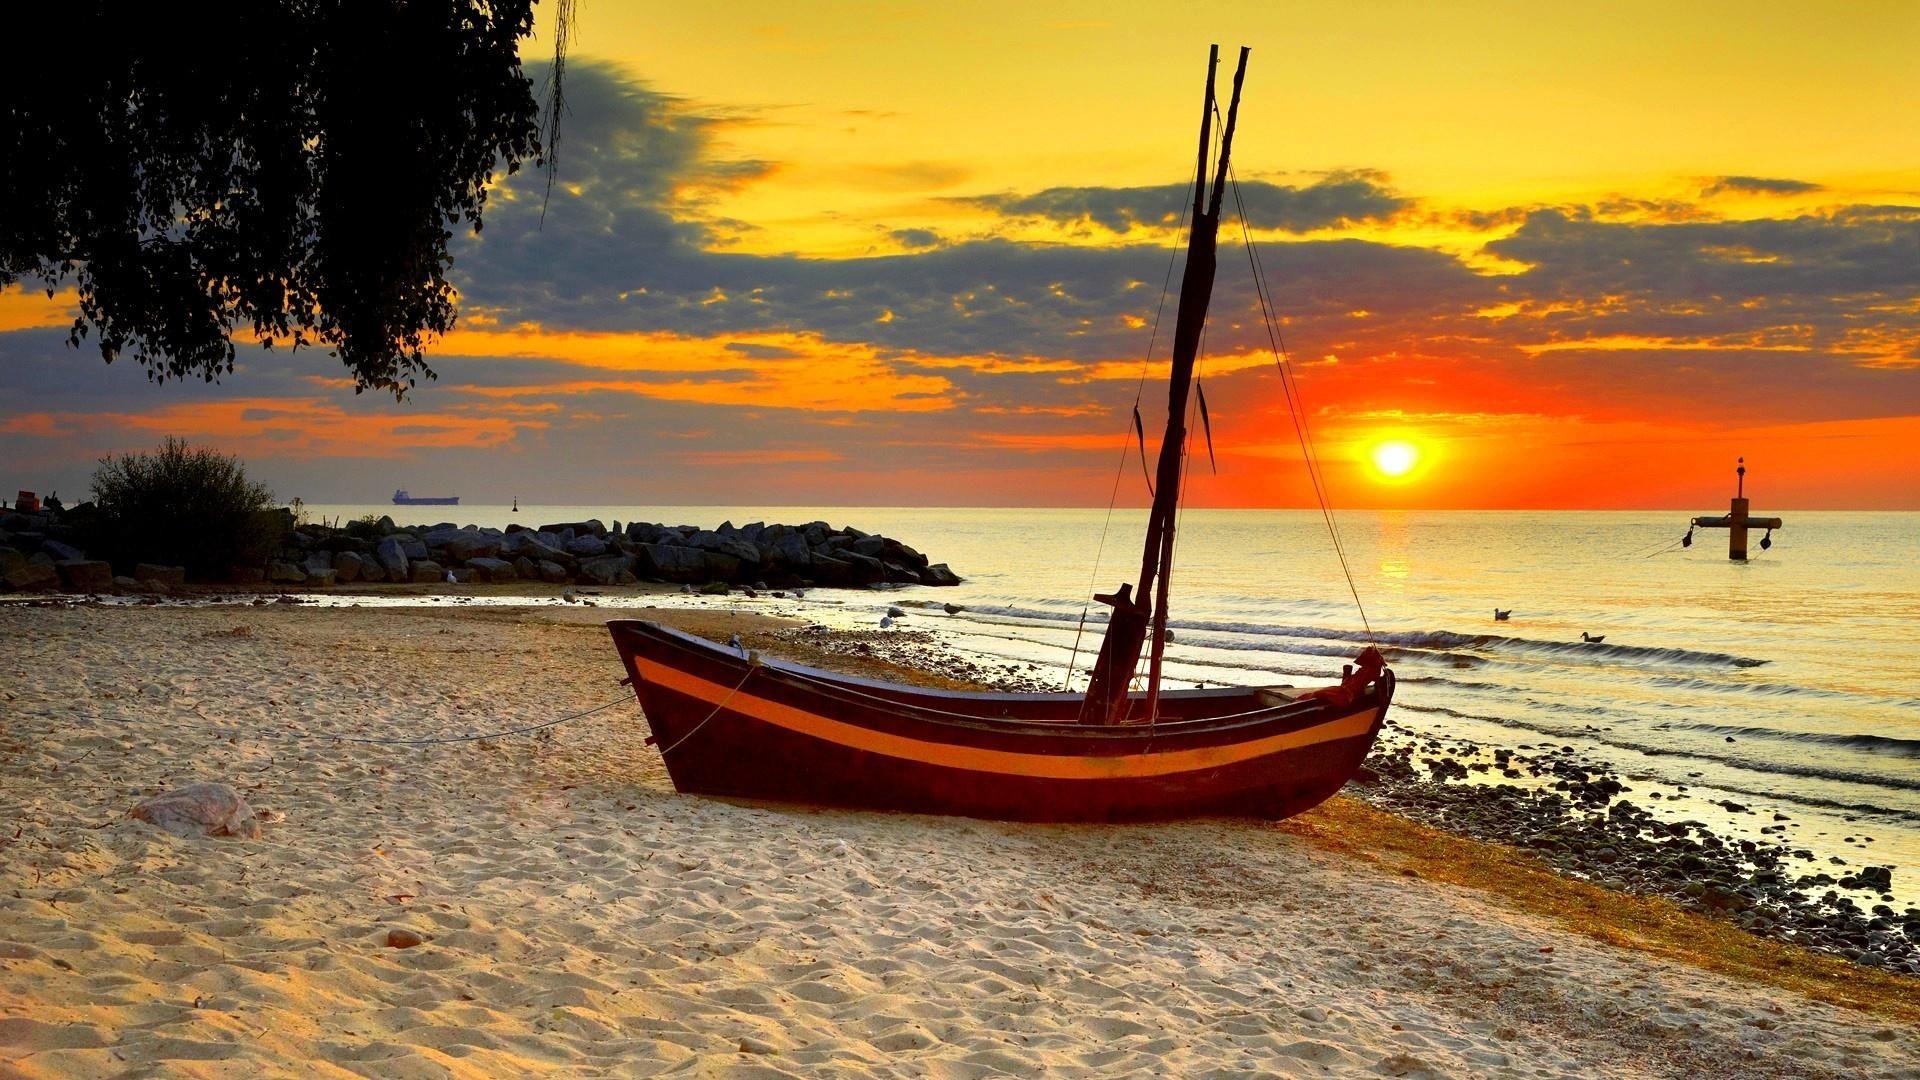 New Free Photos California Boat Sea Coast Coastline Sailboat In 2021 Sunset Colors Boat Beautiful Landscapes